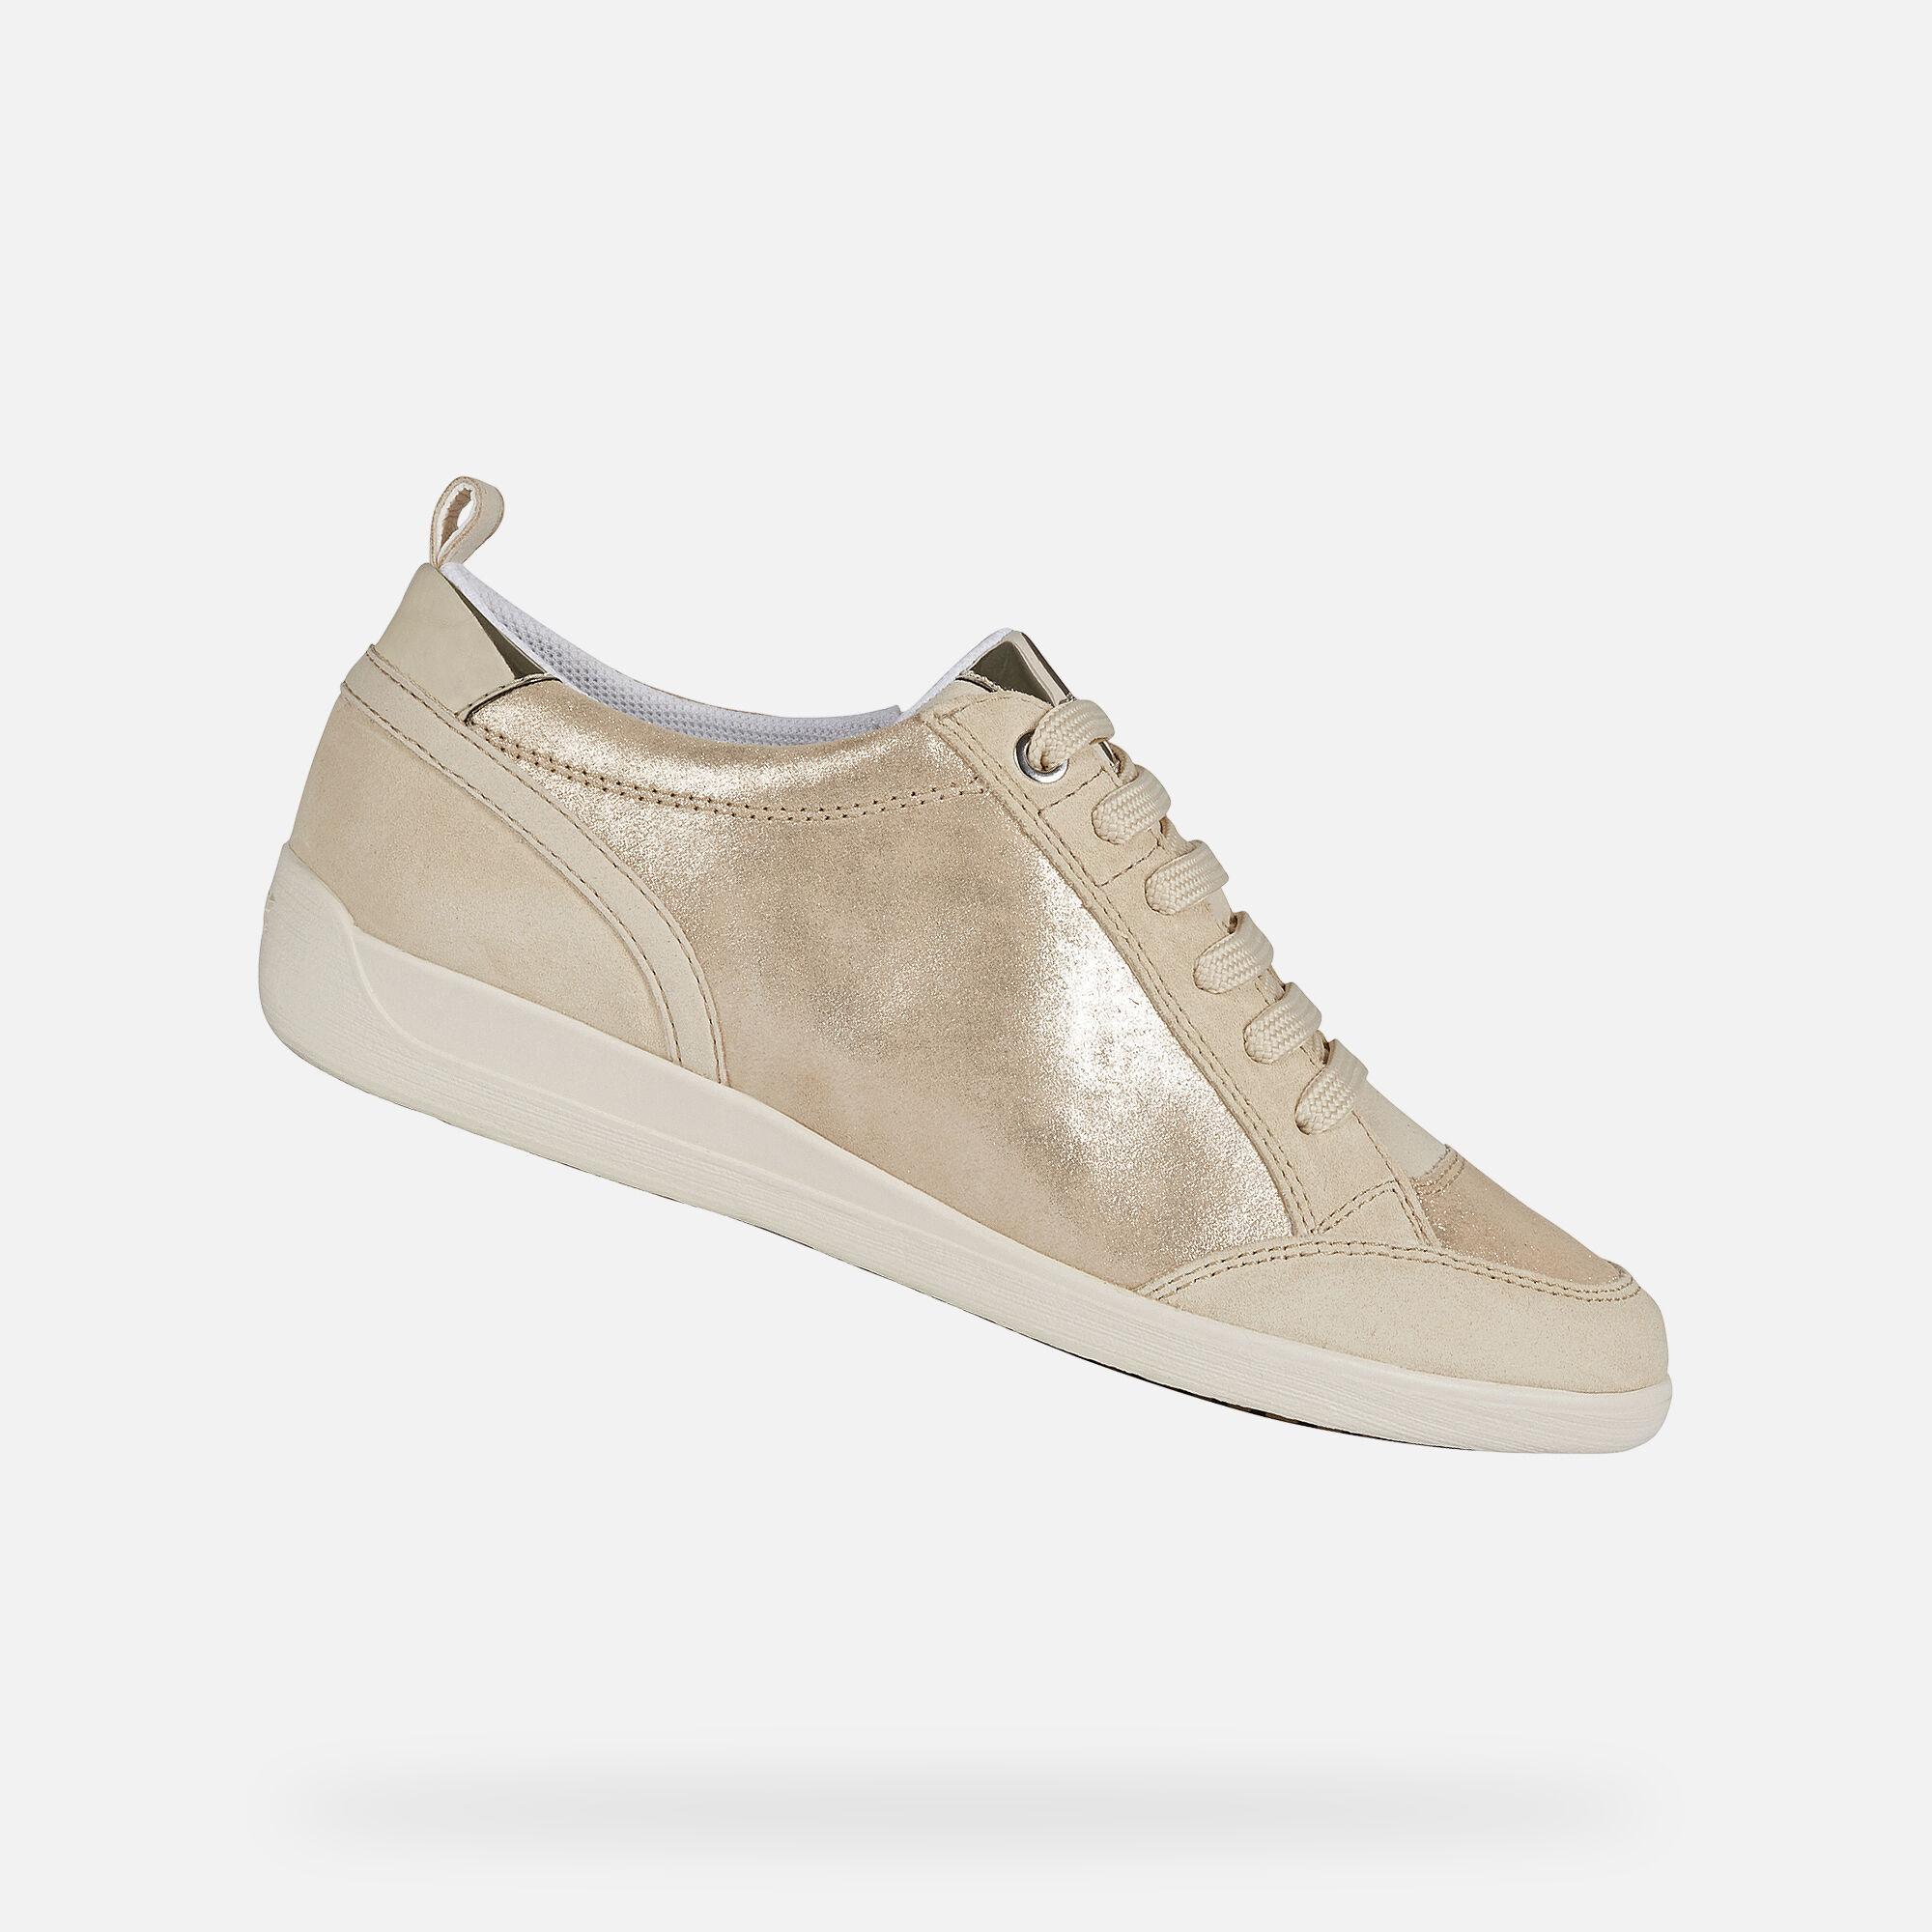 Geox MYRIA Woman: Sand Sneakers   Geox